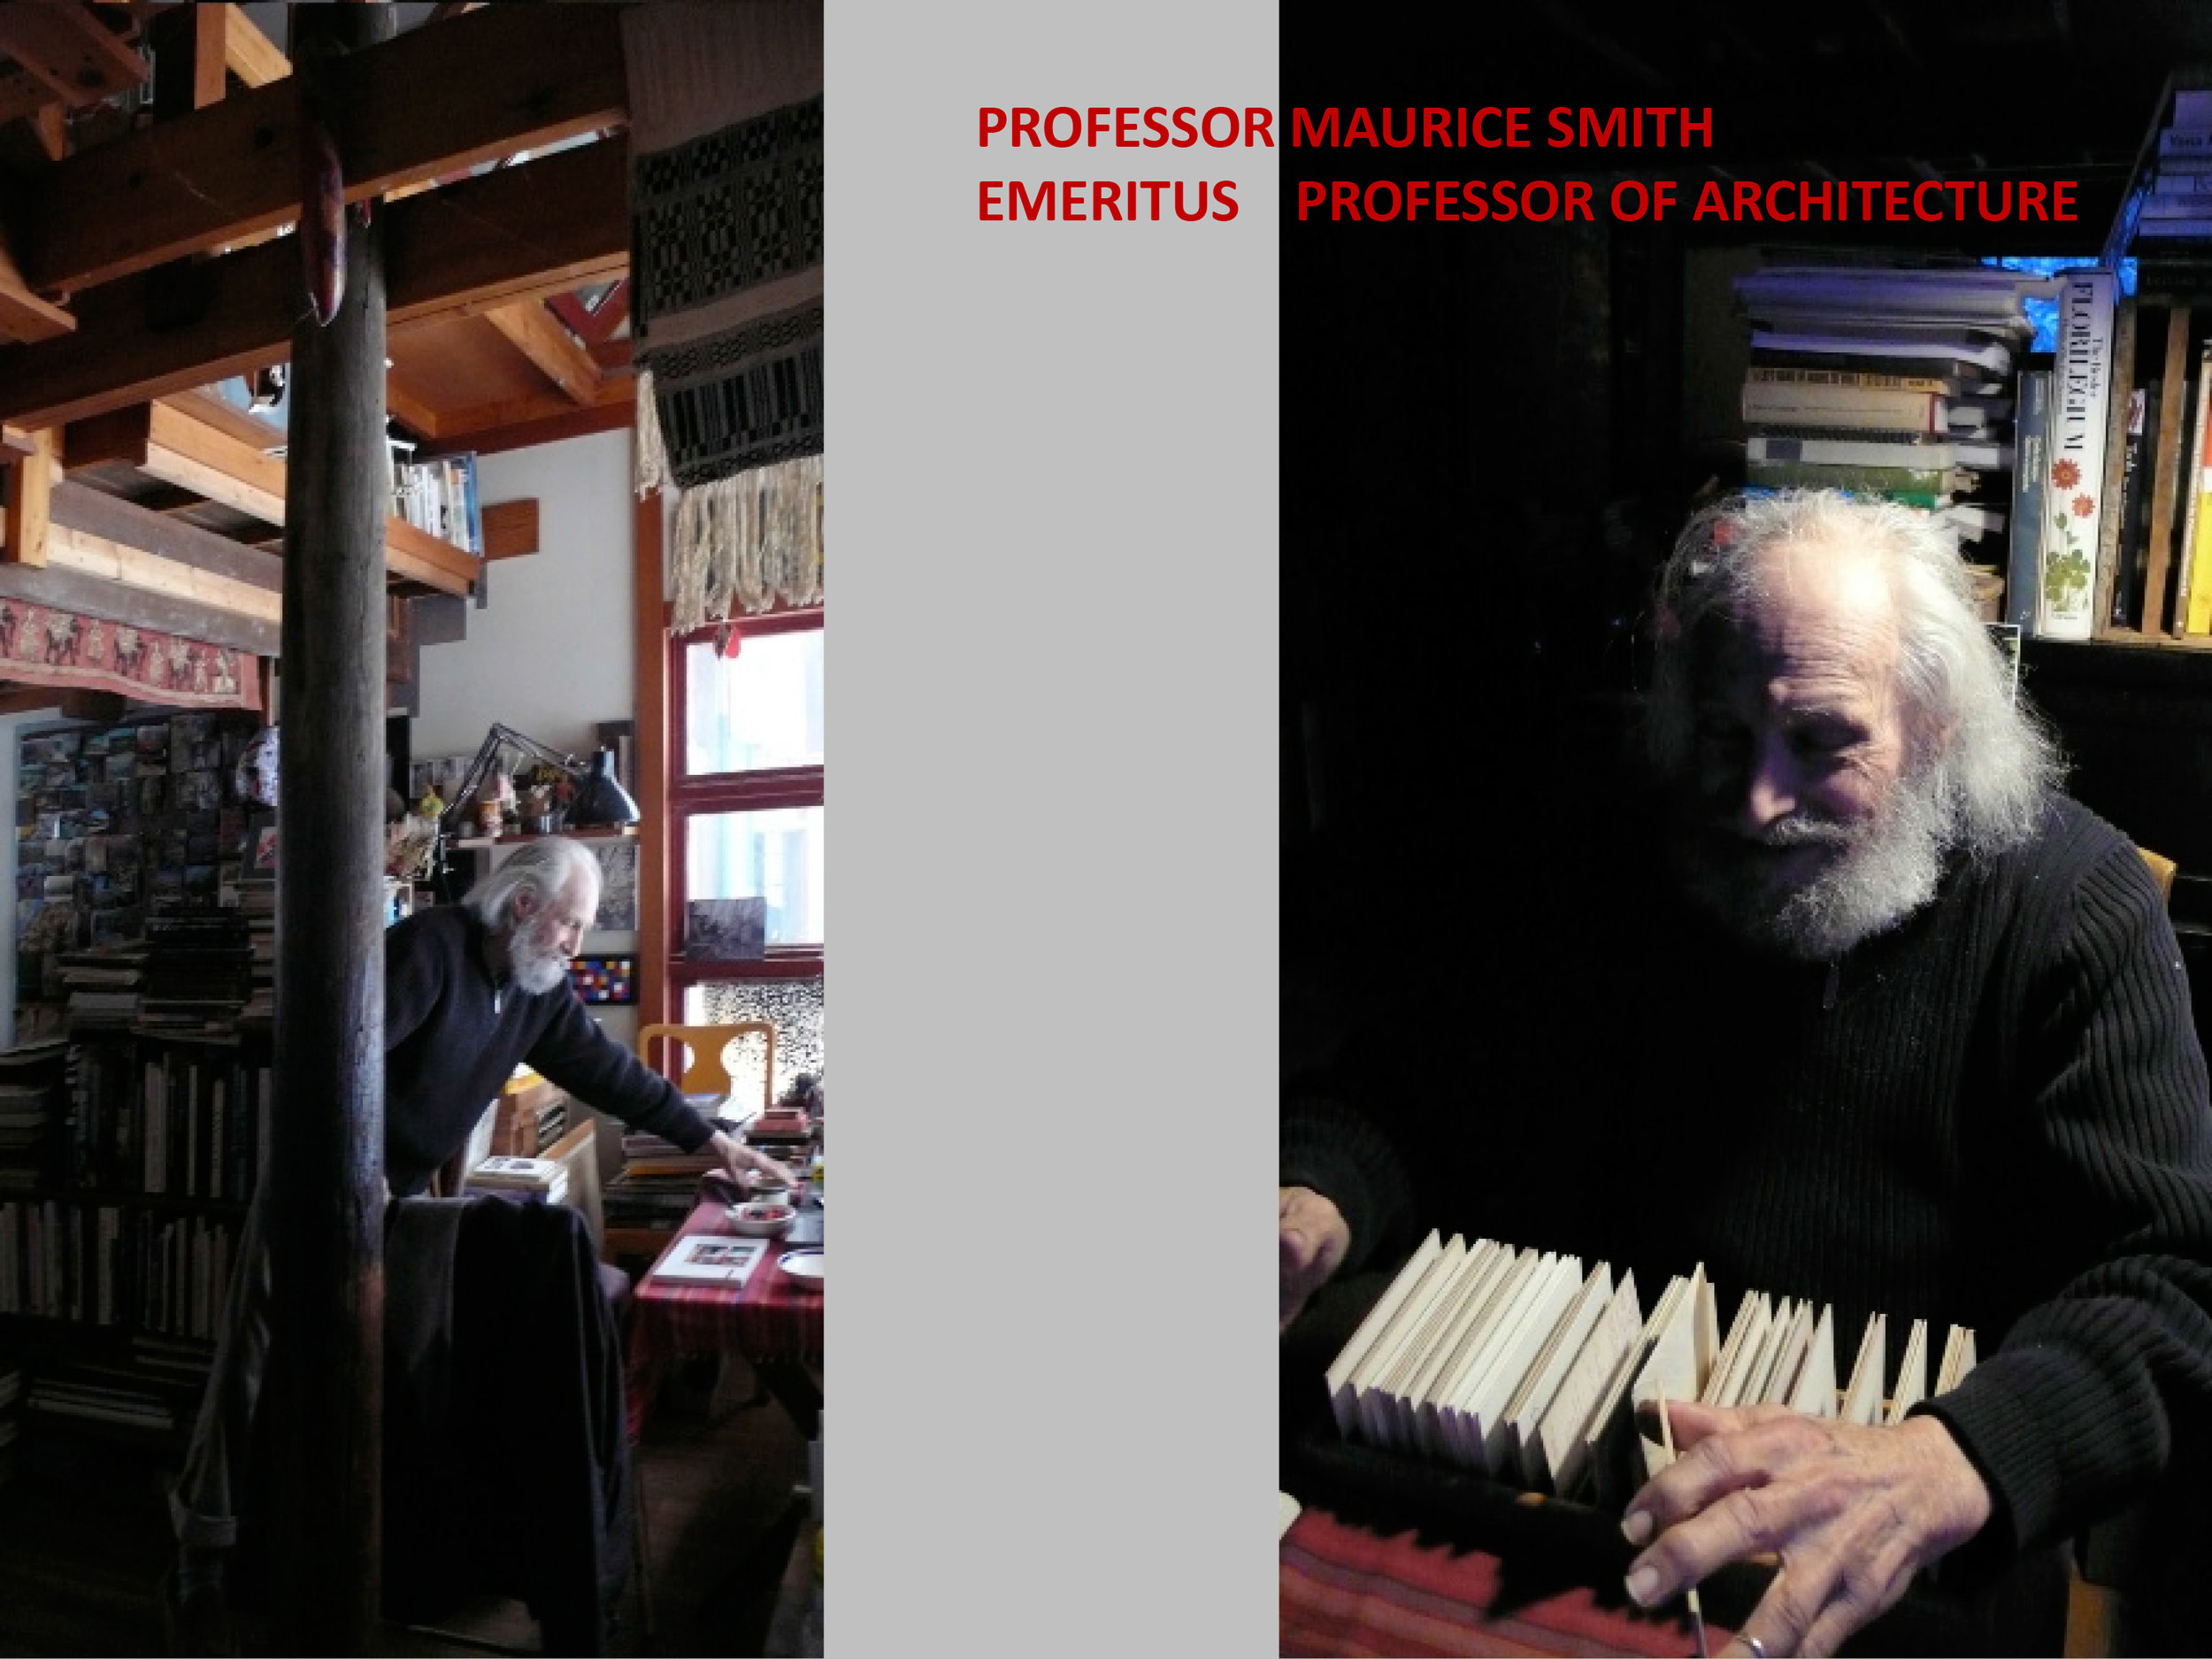 MIT ARCHITECTURE 150 SAN FRANCISCO SLIDESHOW-25 copy.jpg